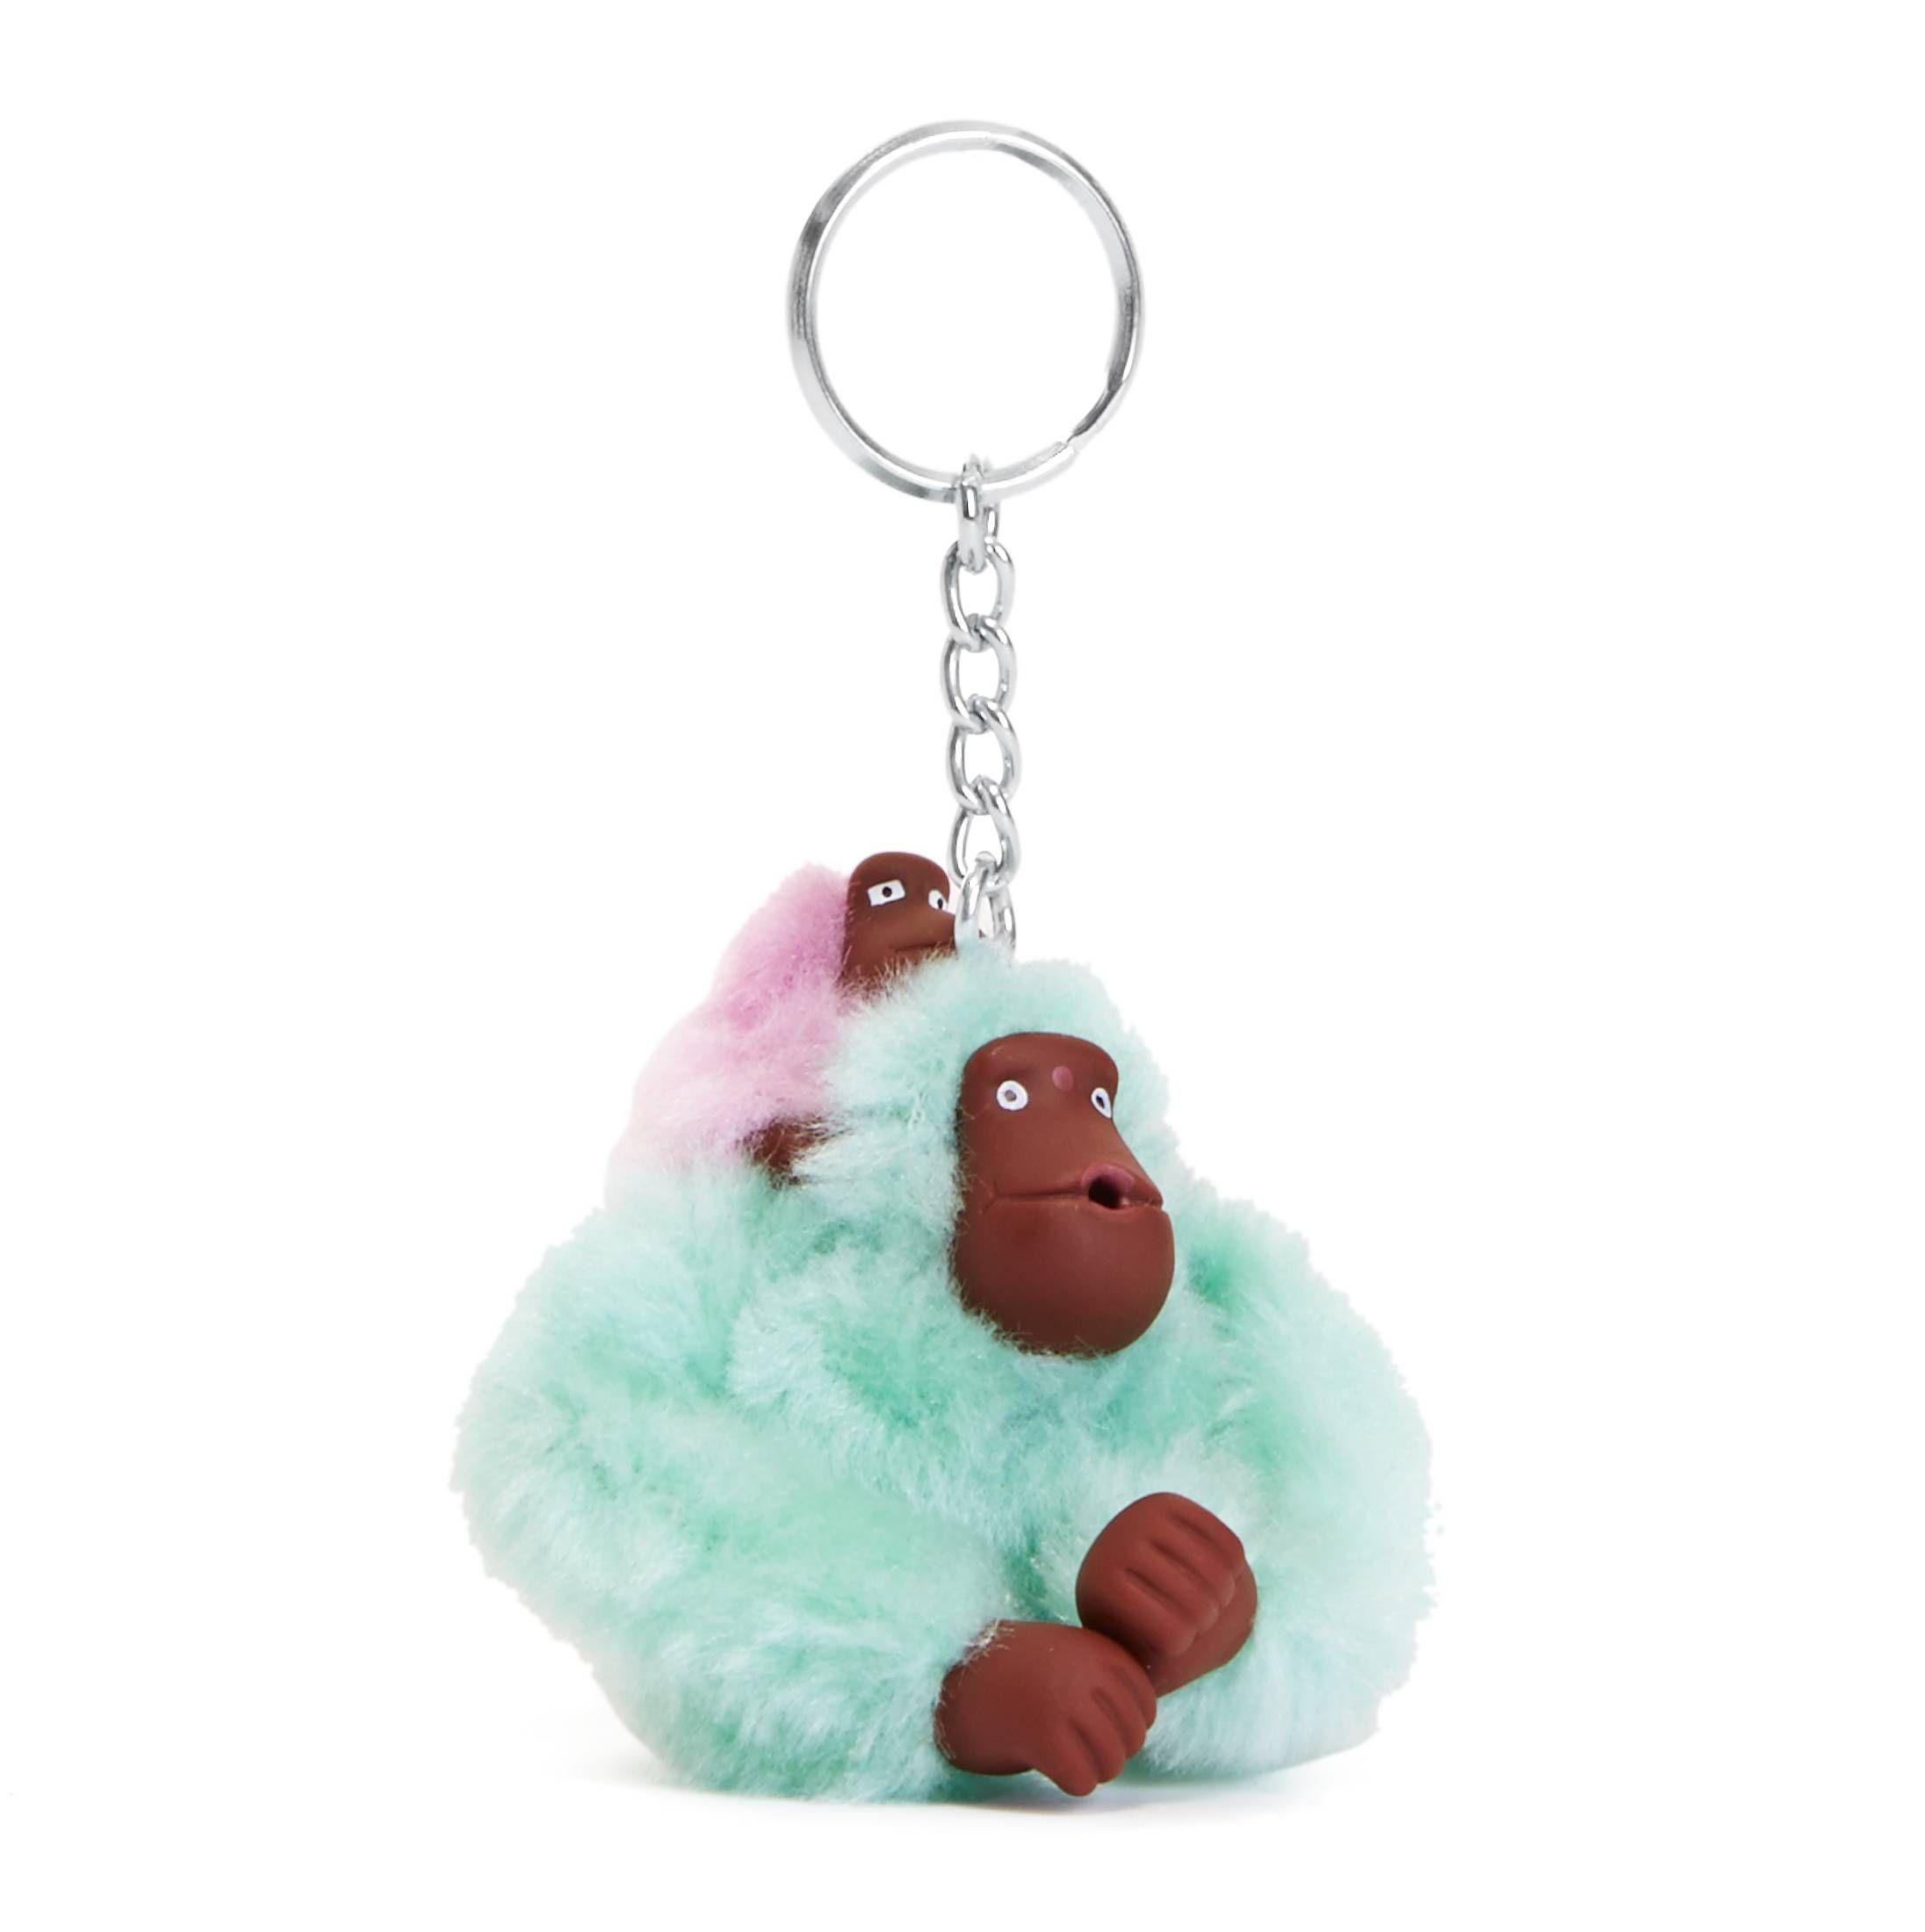 b394bb7a5 Baby Monkey Keychain | Wishlist | Kipling monkey, Monkey y Cute